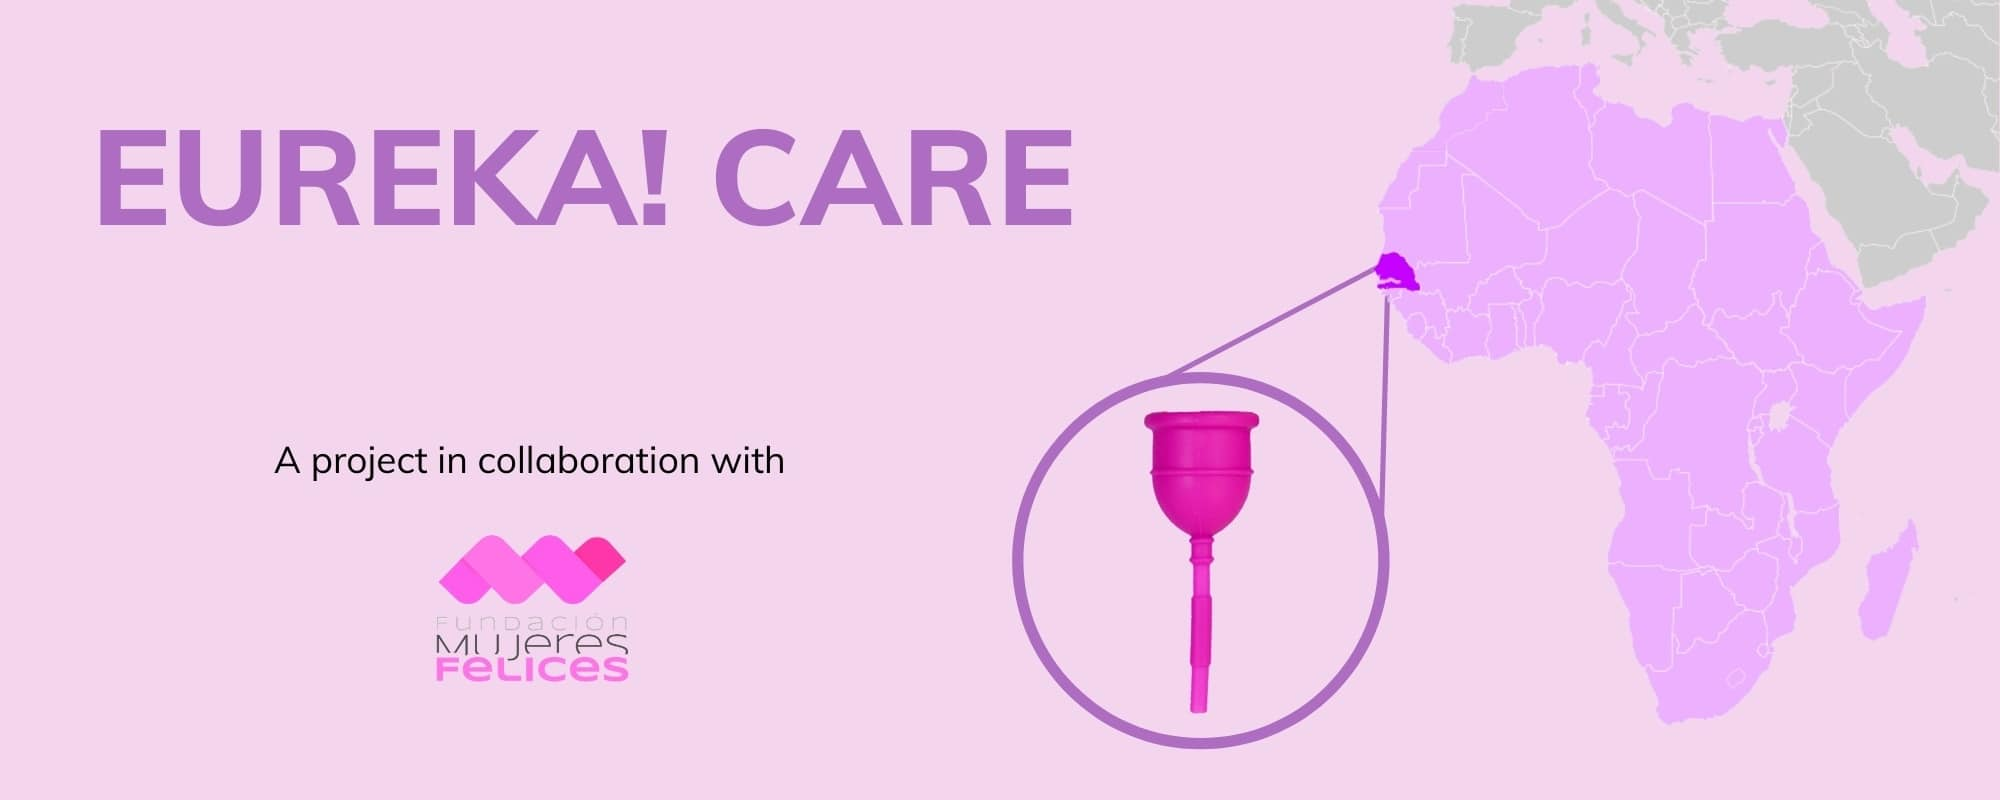 Eureka! Care project